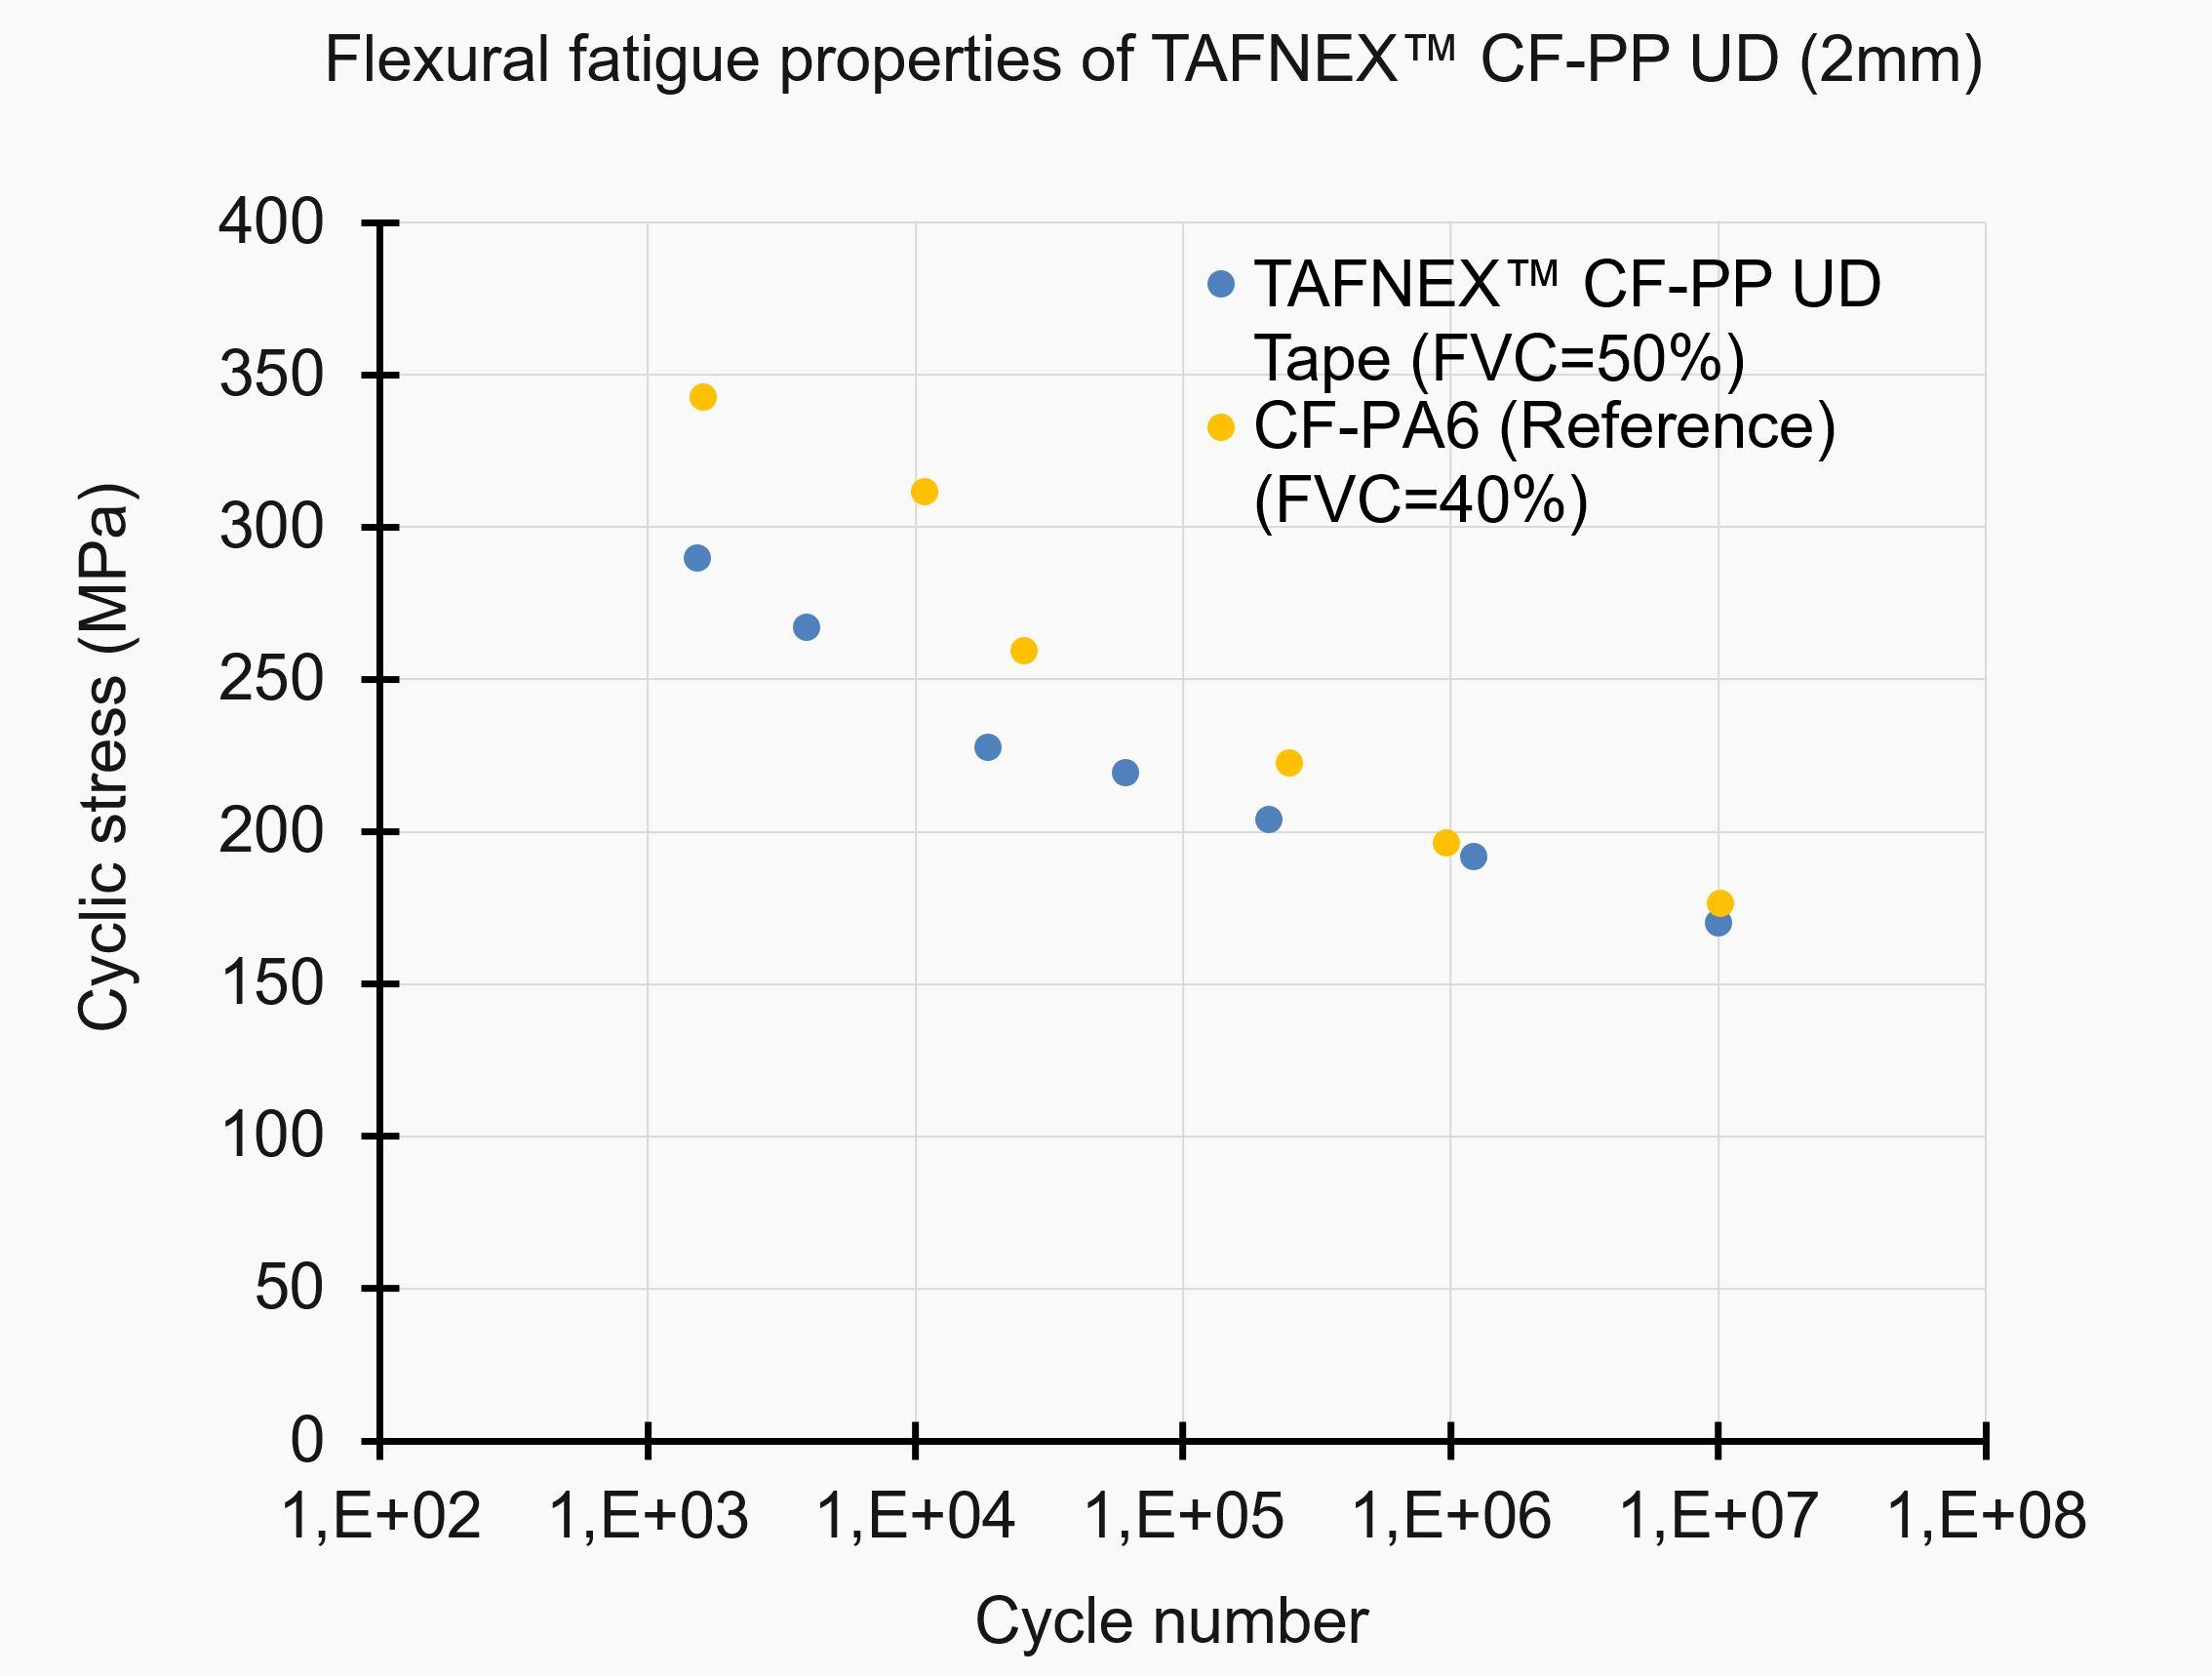 Flexural fatigue properties of TAFNEX